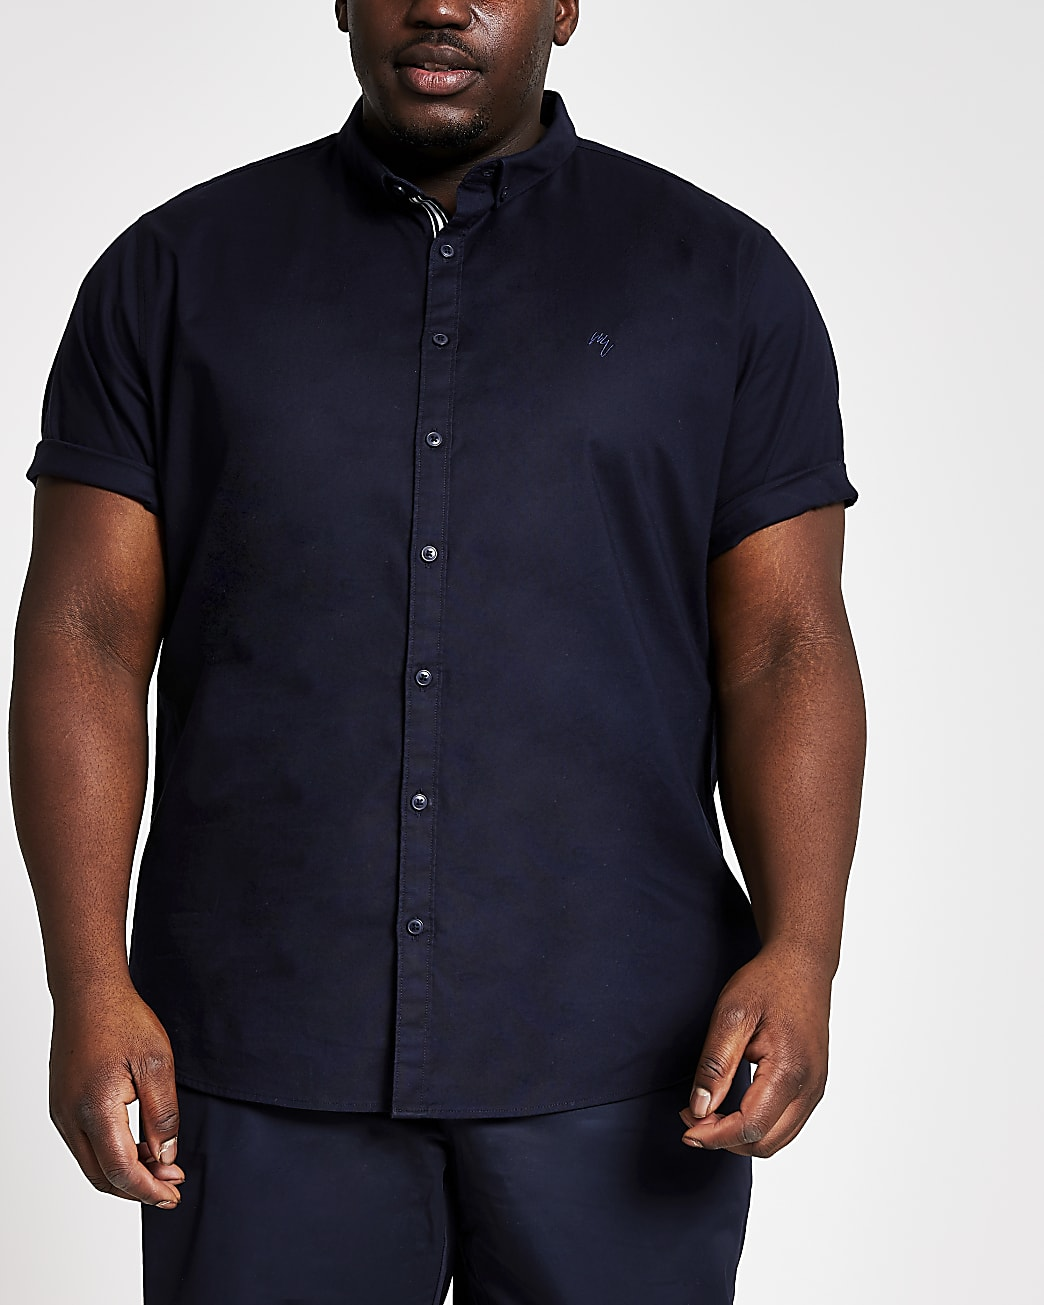 Big & Tall navy short sleeve Oxford shirt